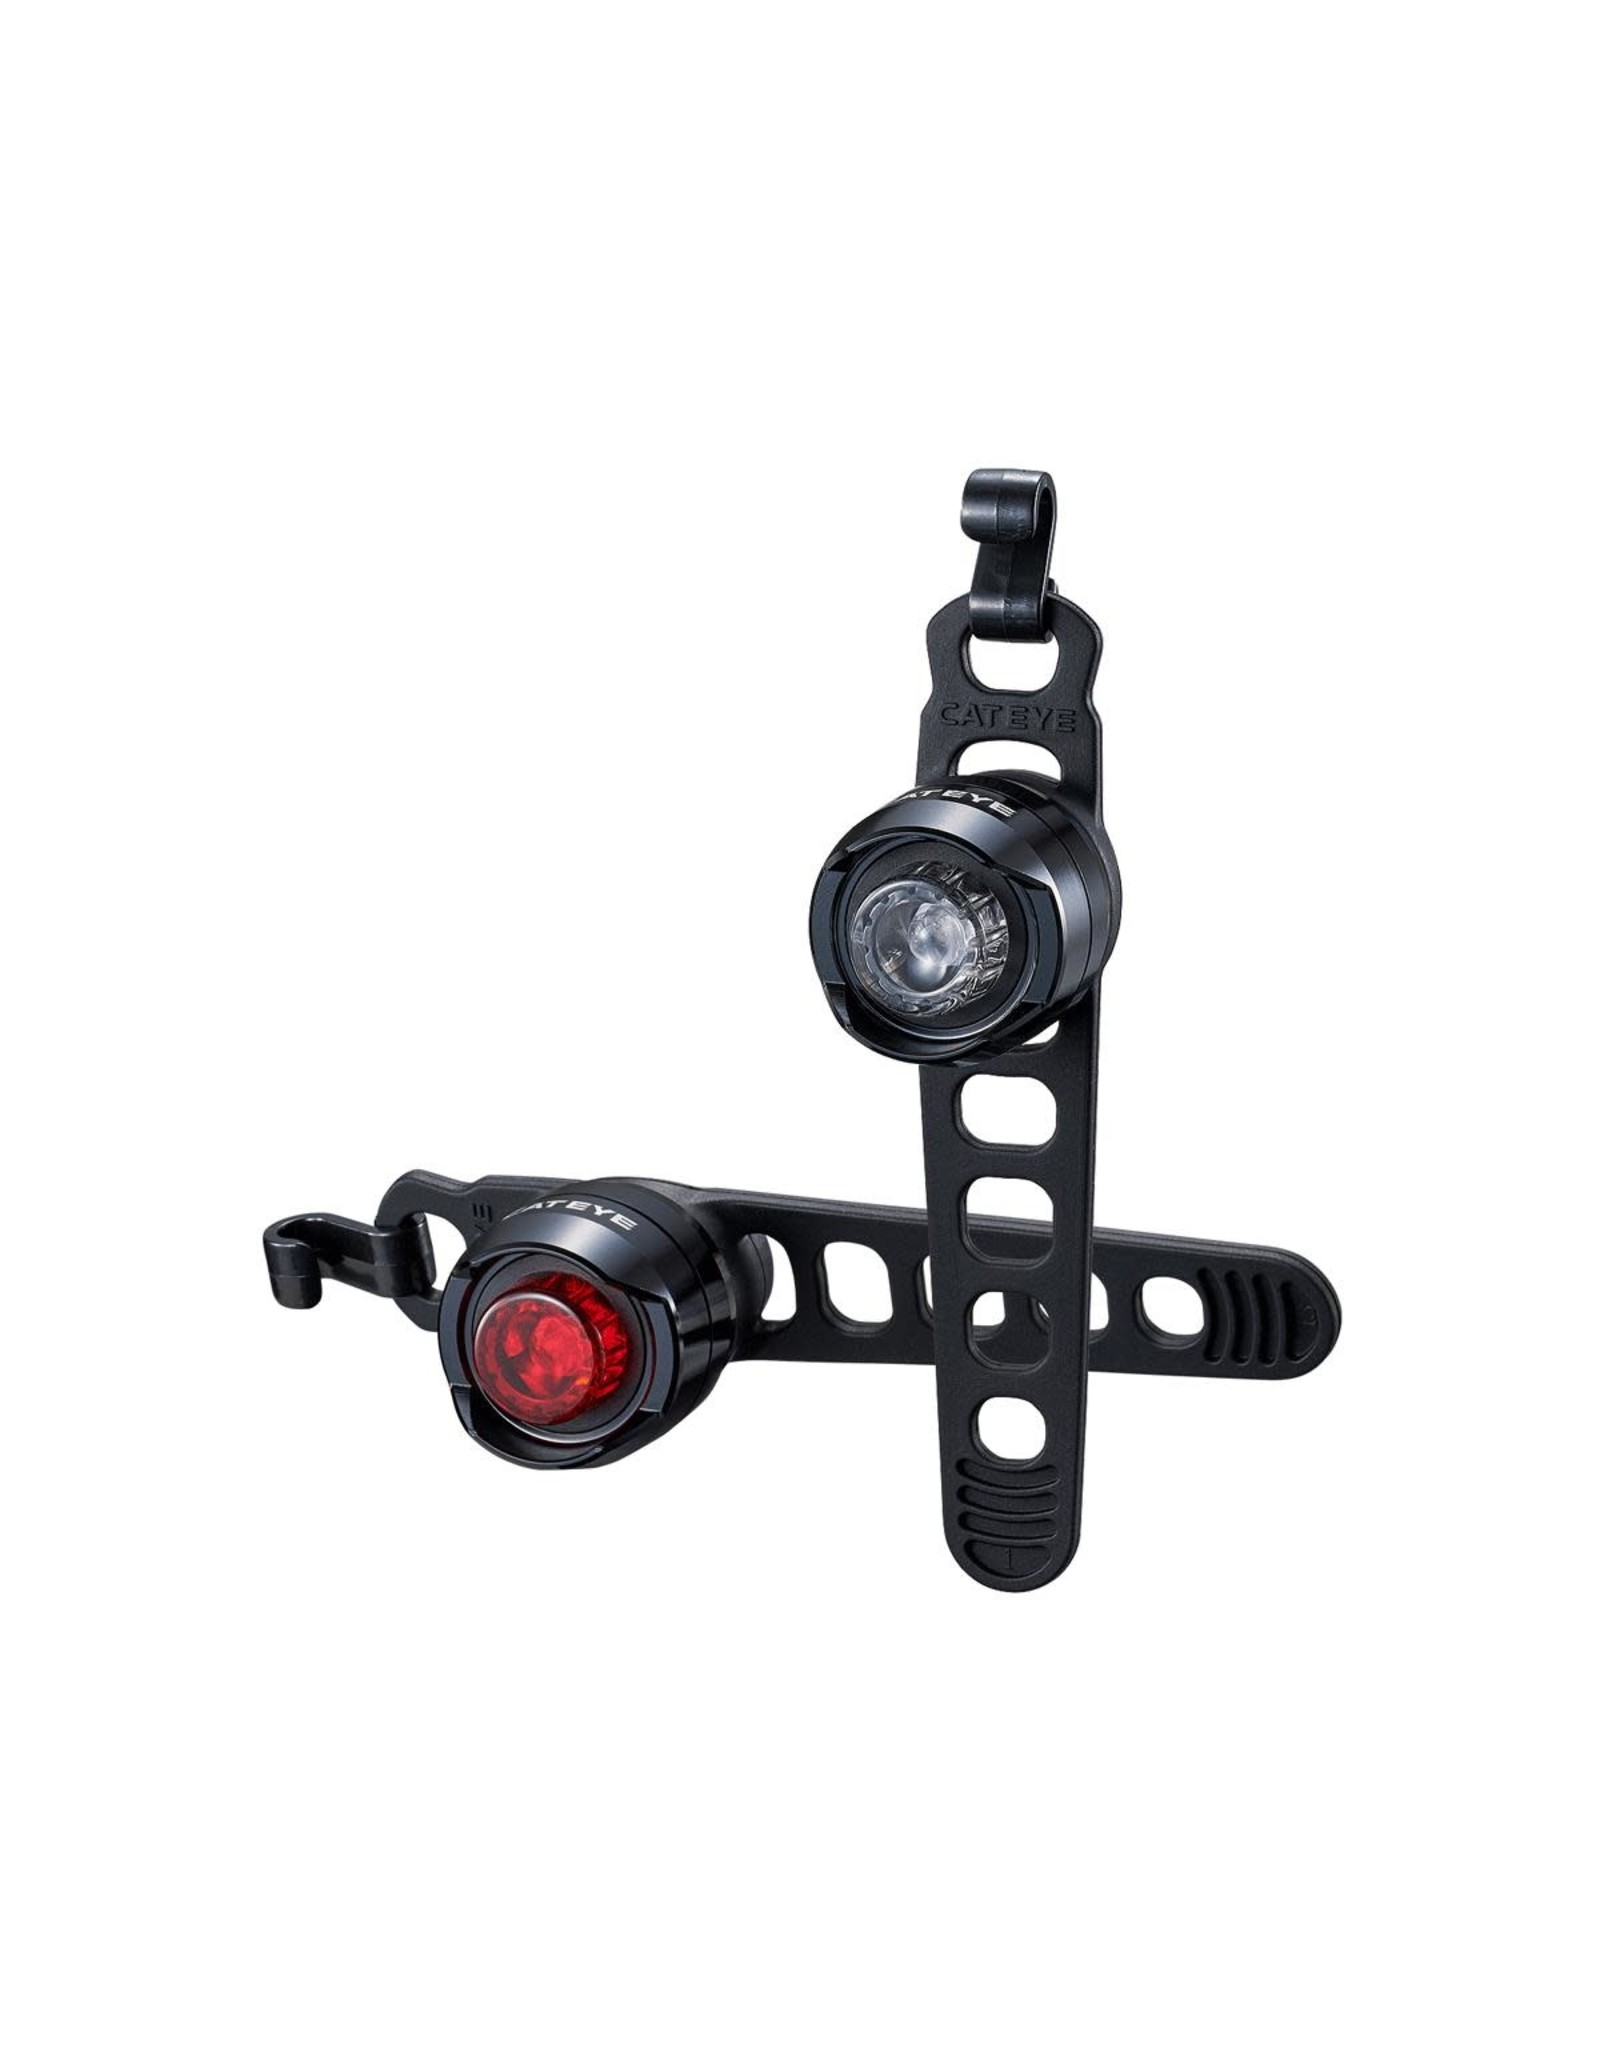 Cateye Light Set Orb Black Pair